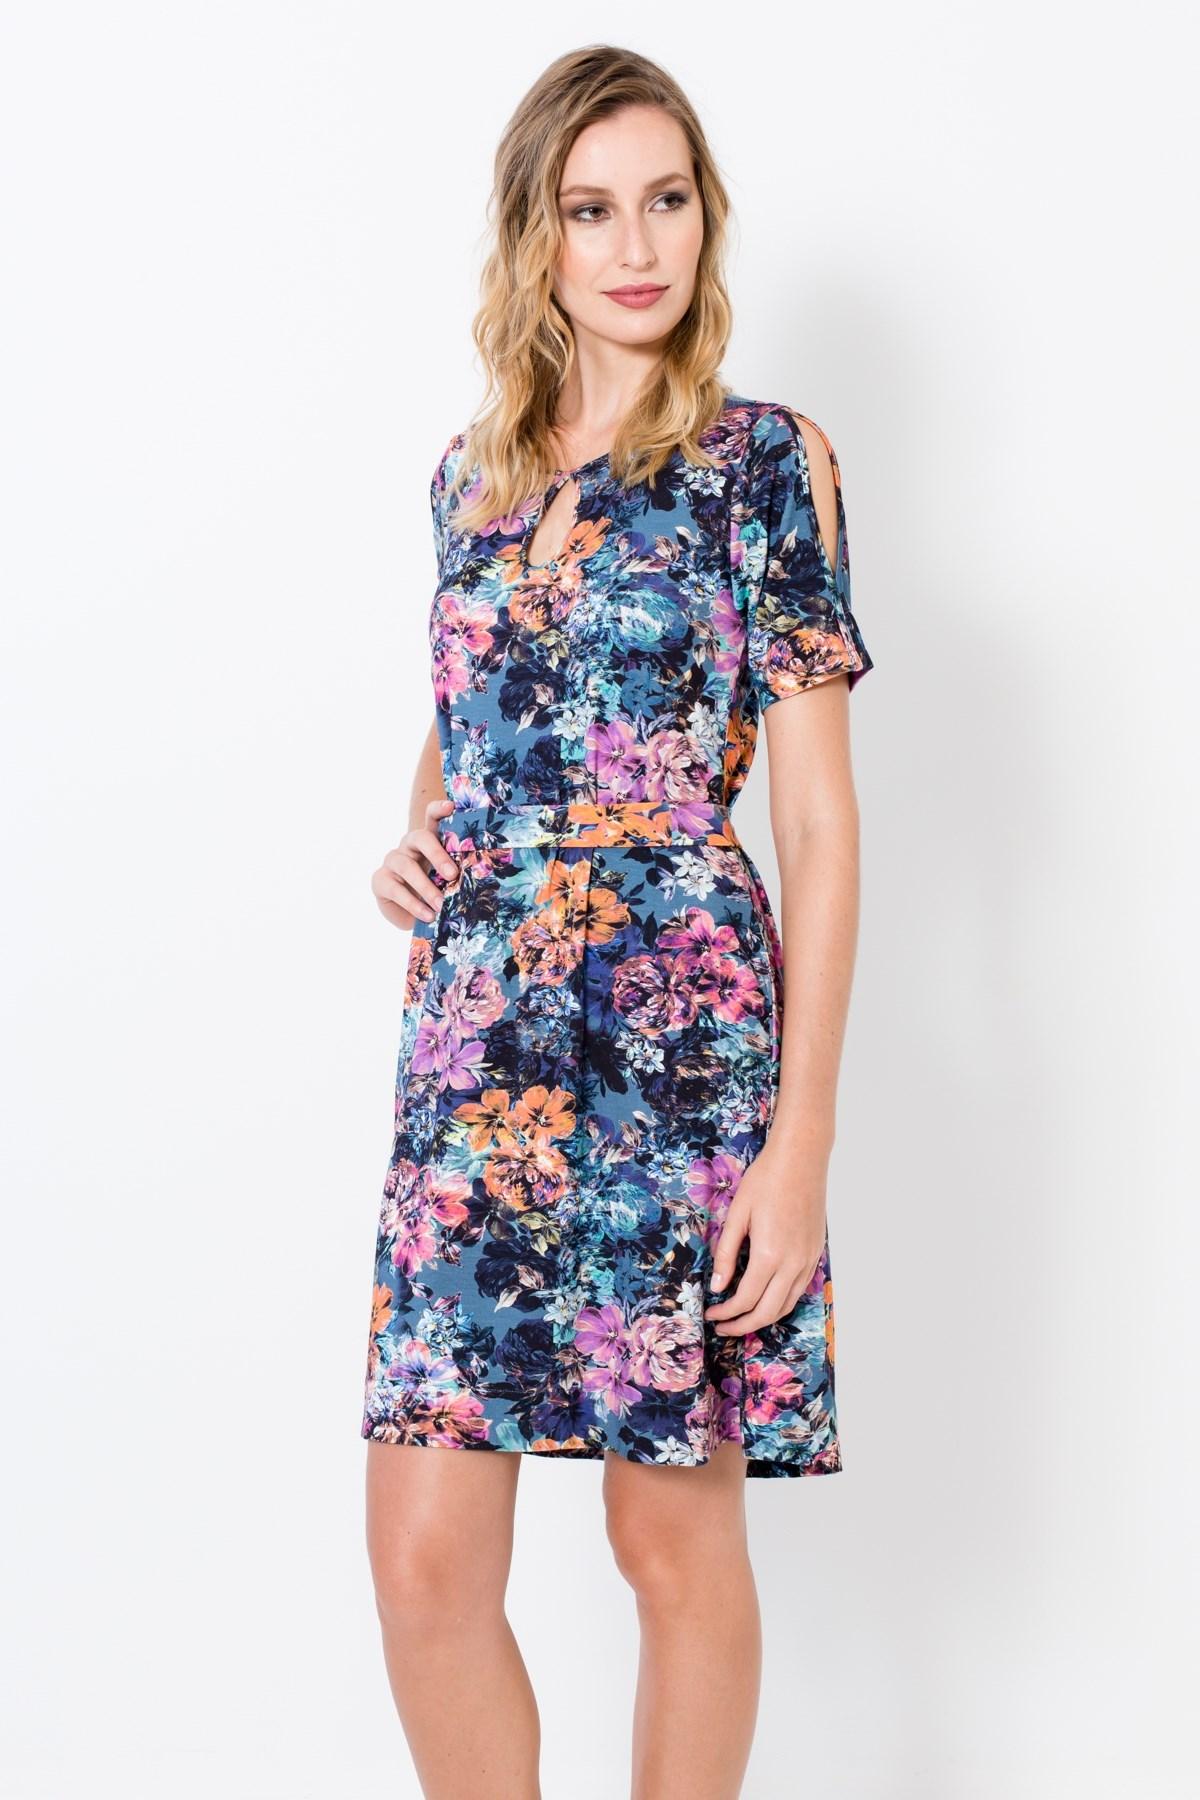 85899f3ba Vestido Aquarela Floral - Ervadoce